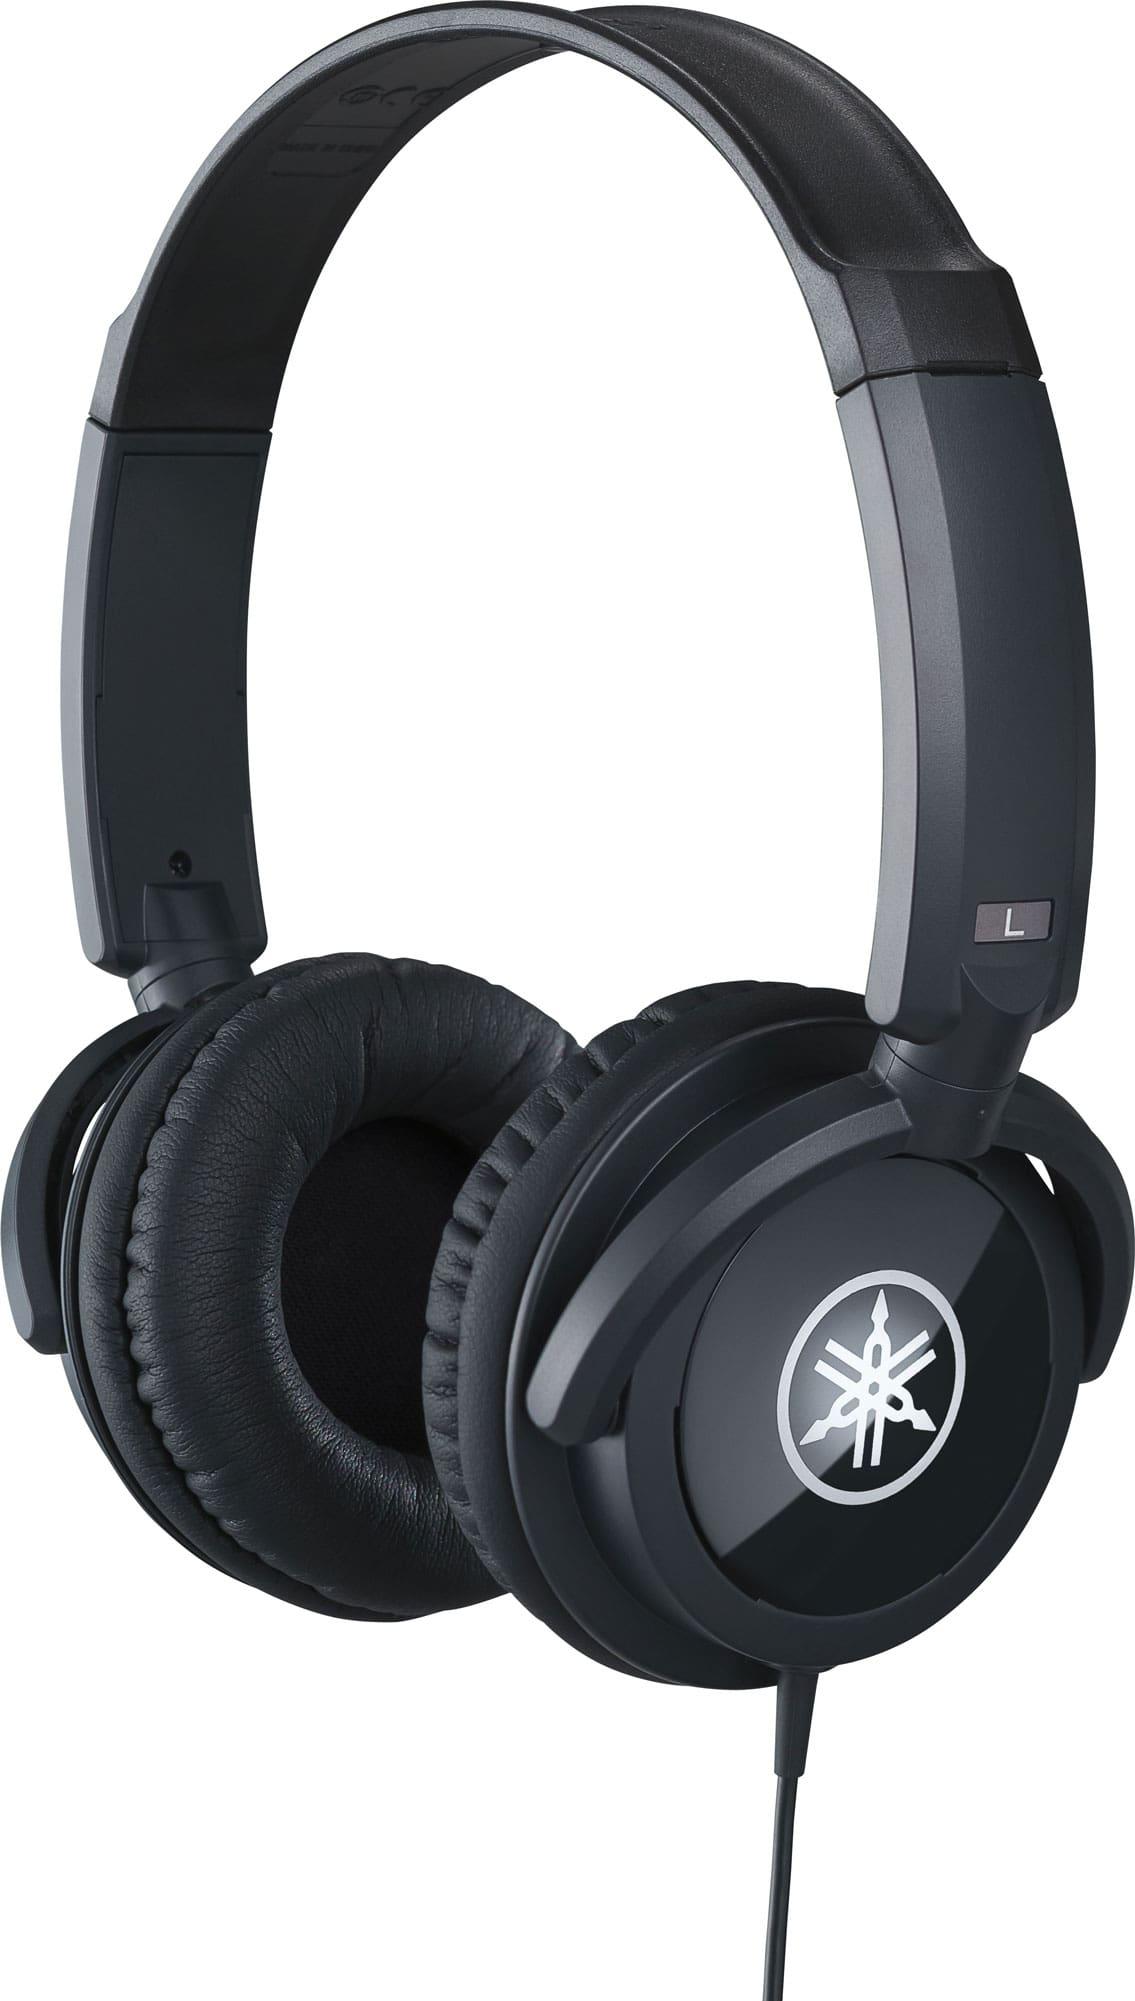 Studiozubehoer - Yamaha HPH 100B Kopfhörer schwarz Retoure (Zustand sehr gut) - Onlineshop Musikhaus Kirstein